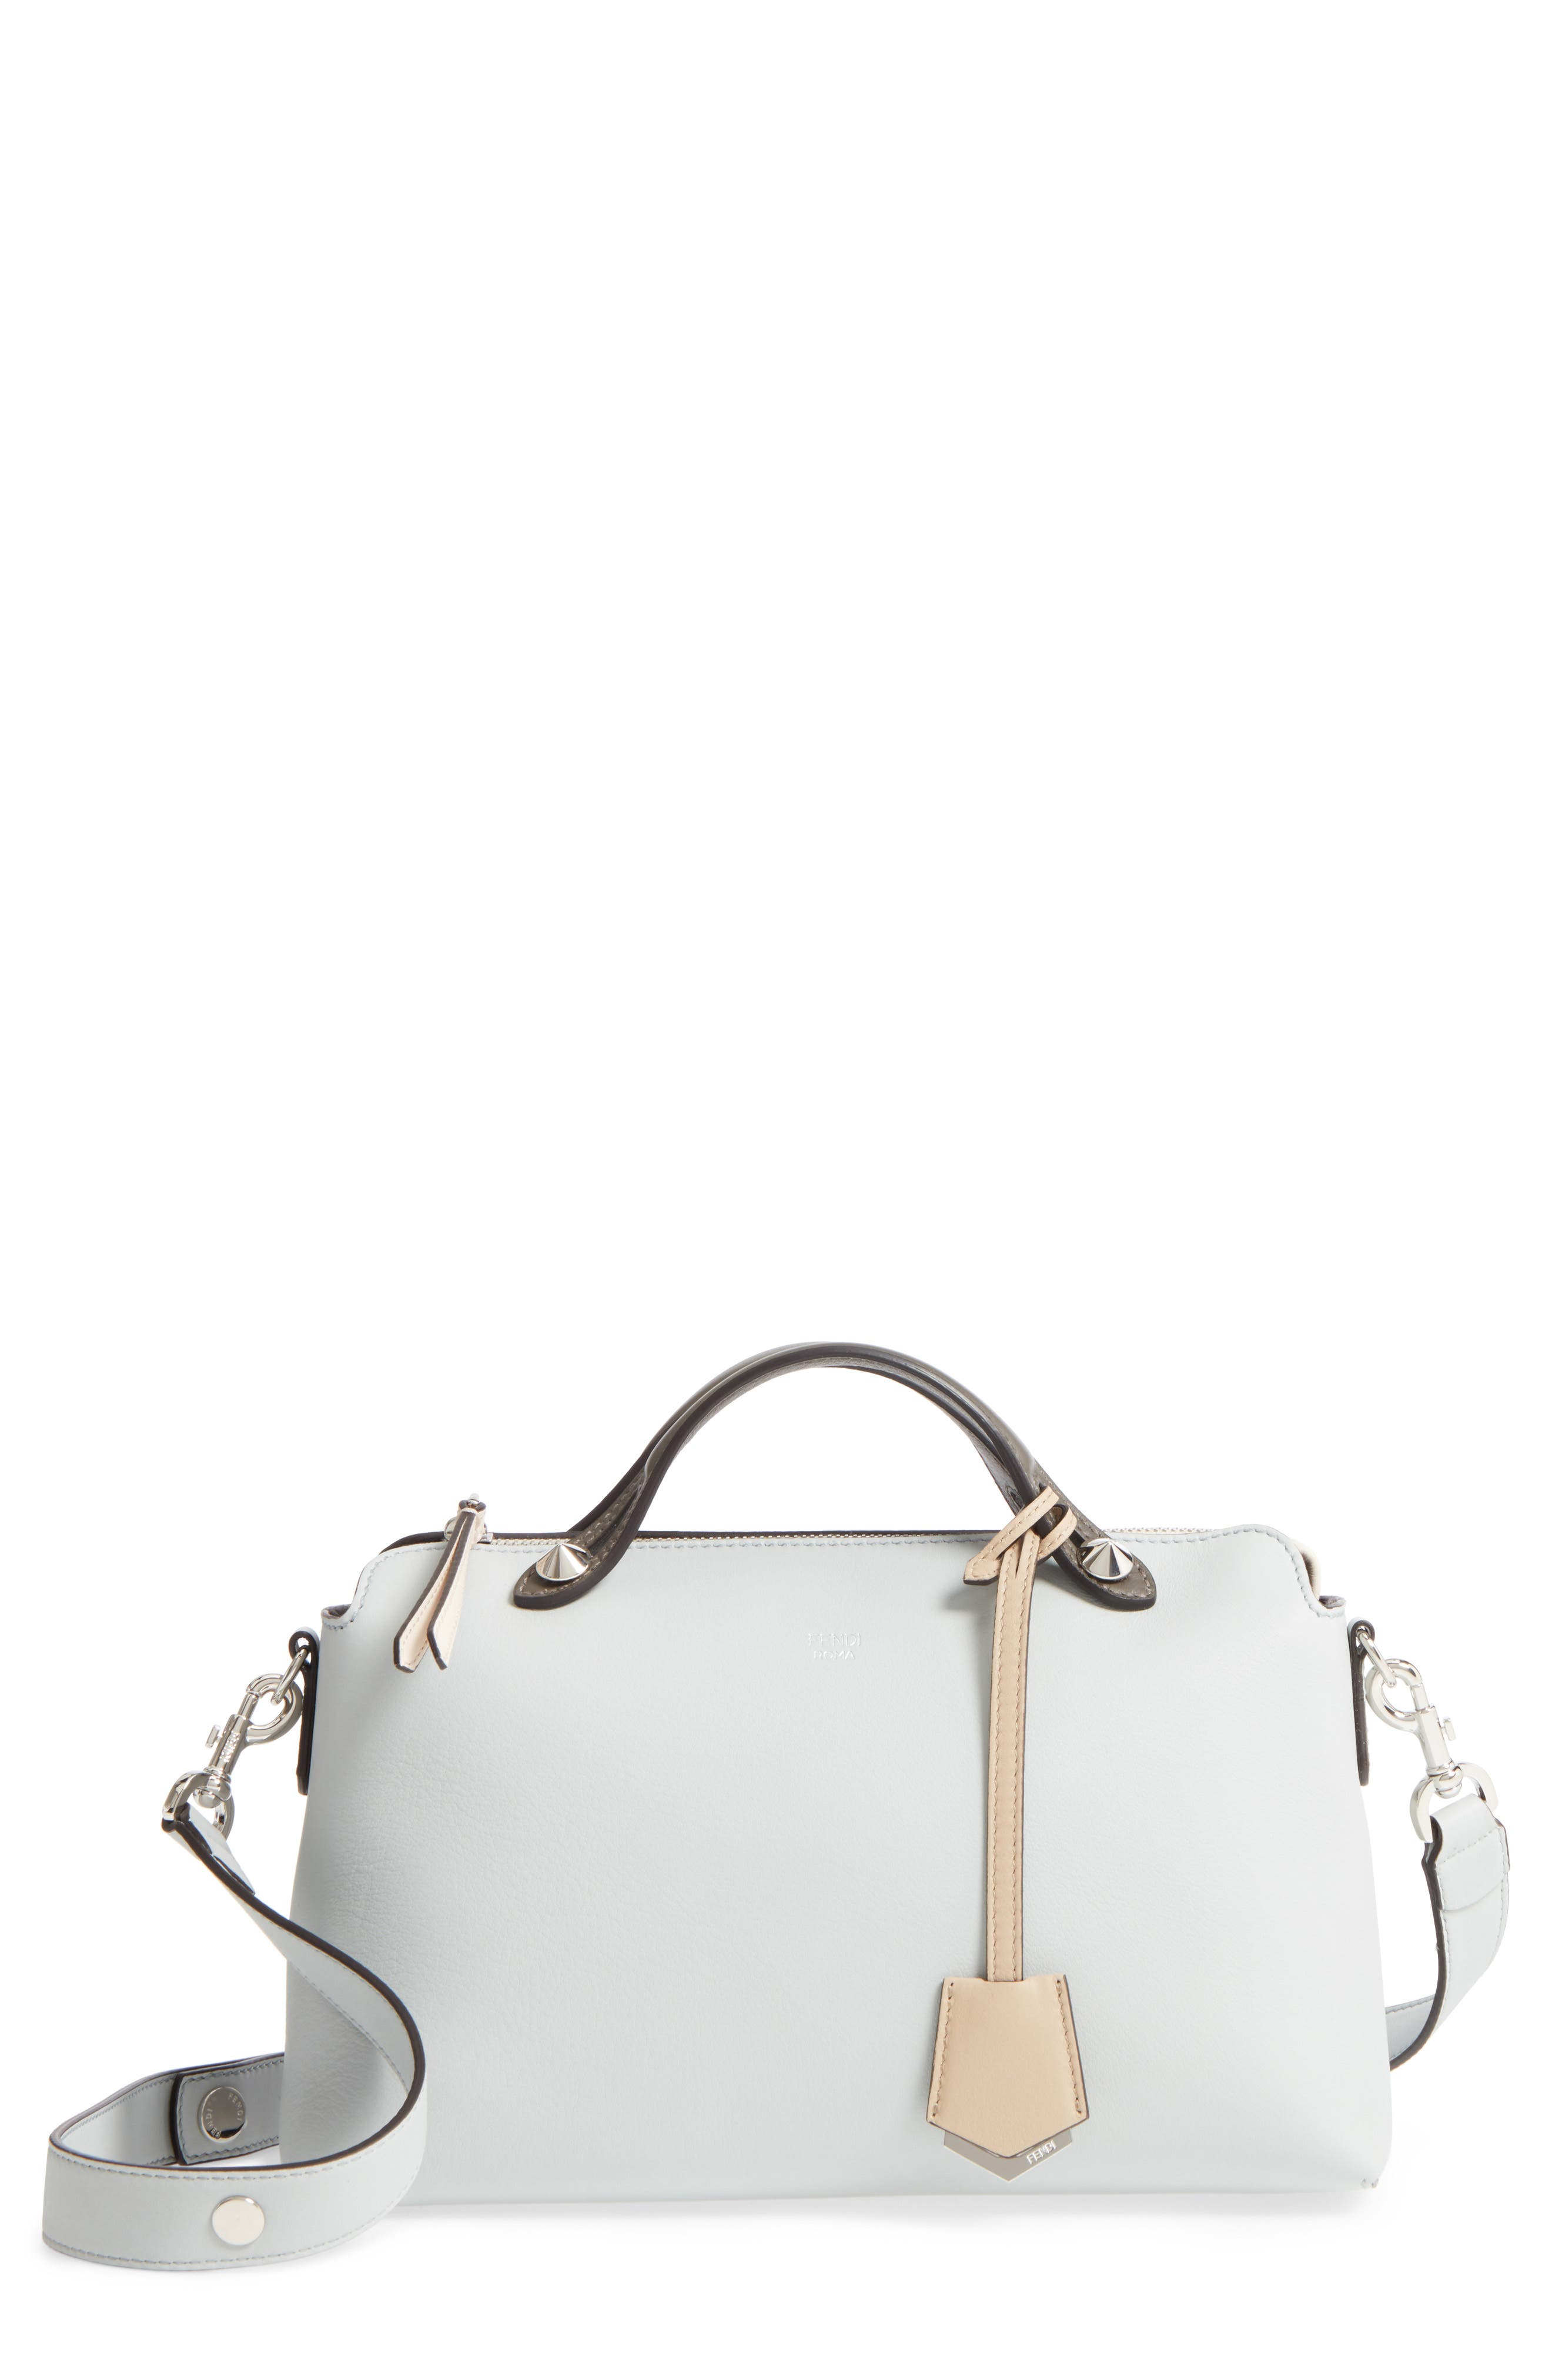 'Medium By the Way' Colorblock Leather Shoulder Bag,                         Main,                         color, GREY PERLA